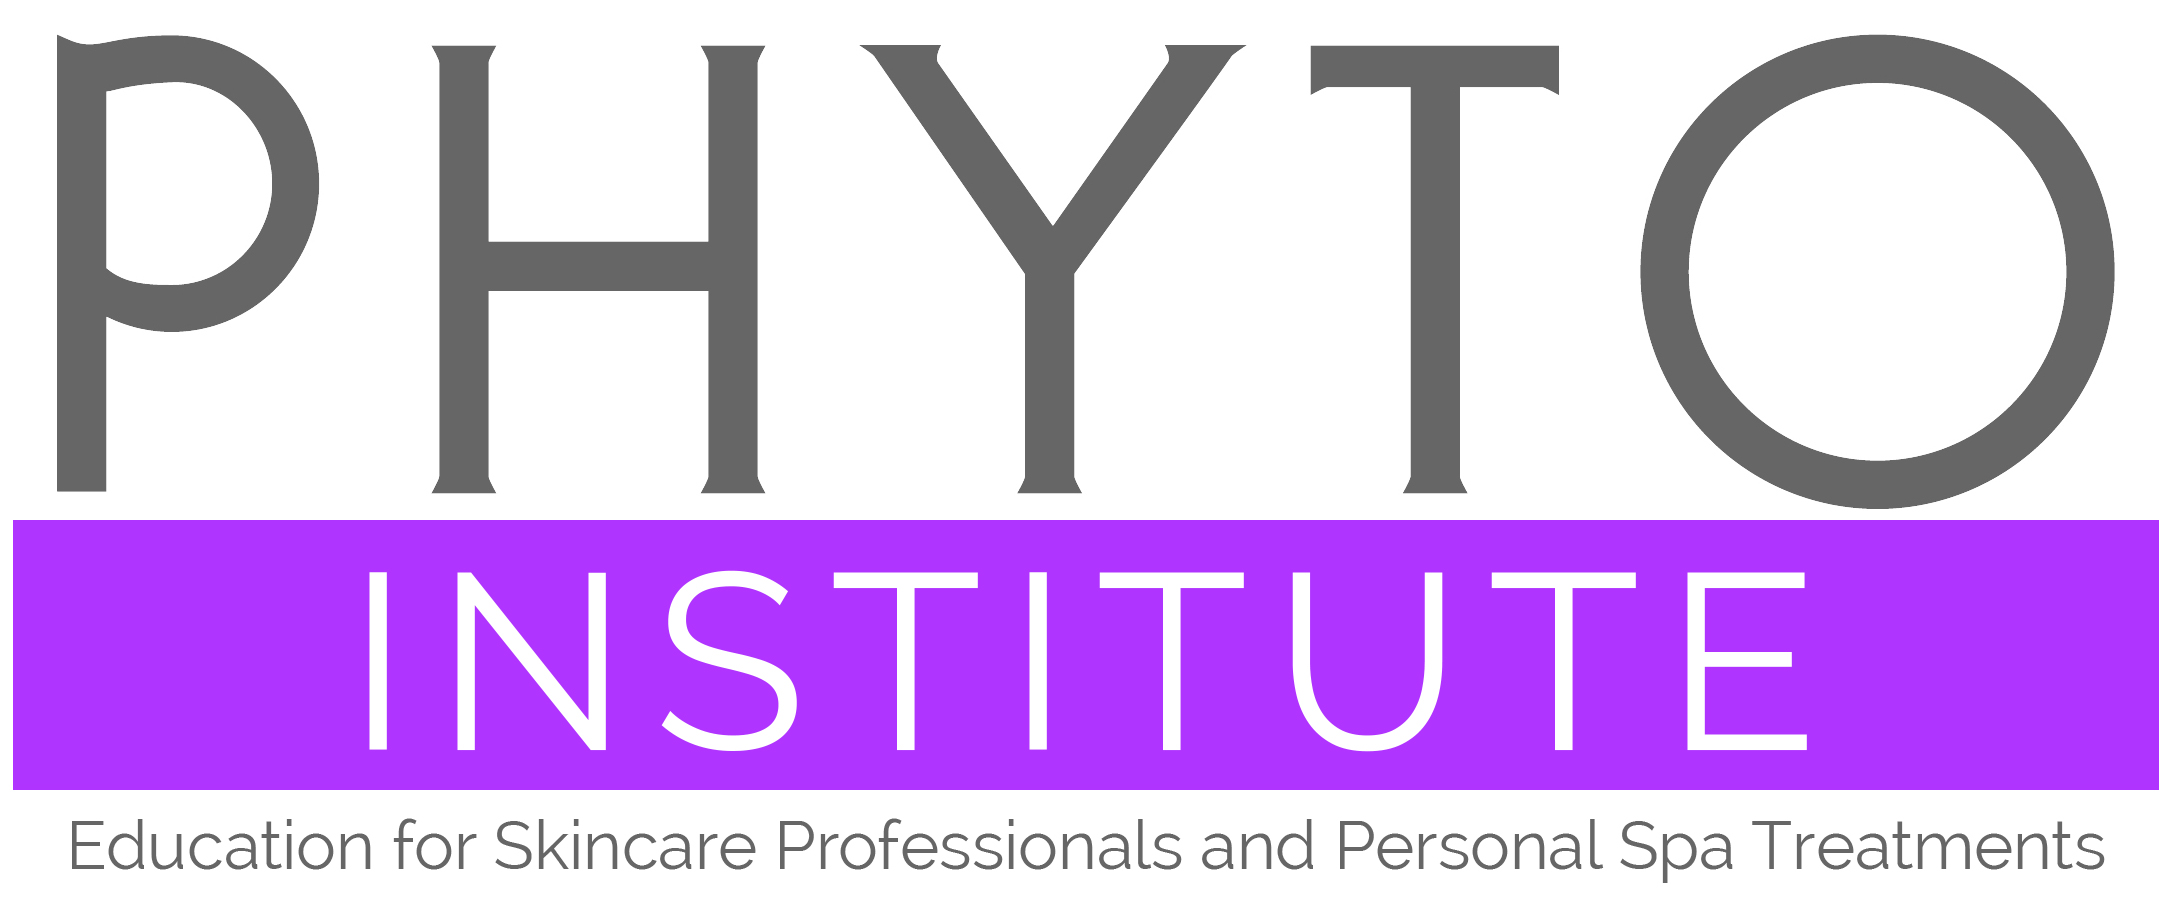 phyto_institute.jpg